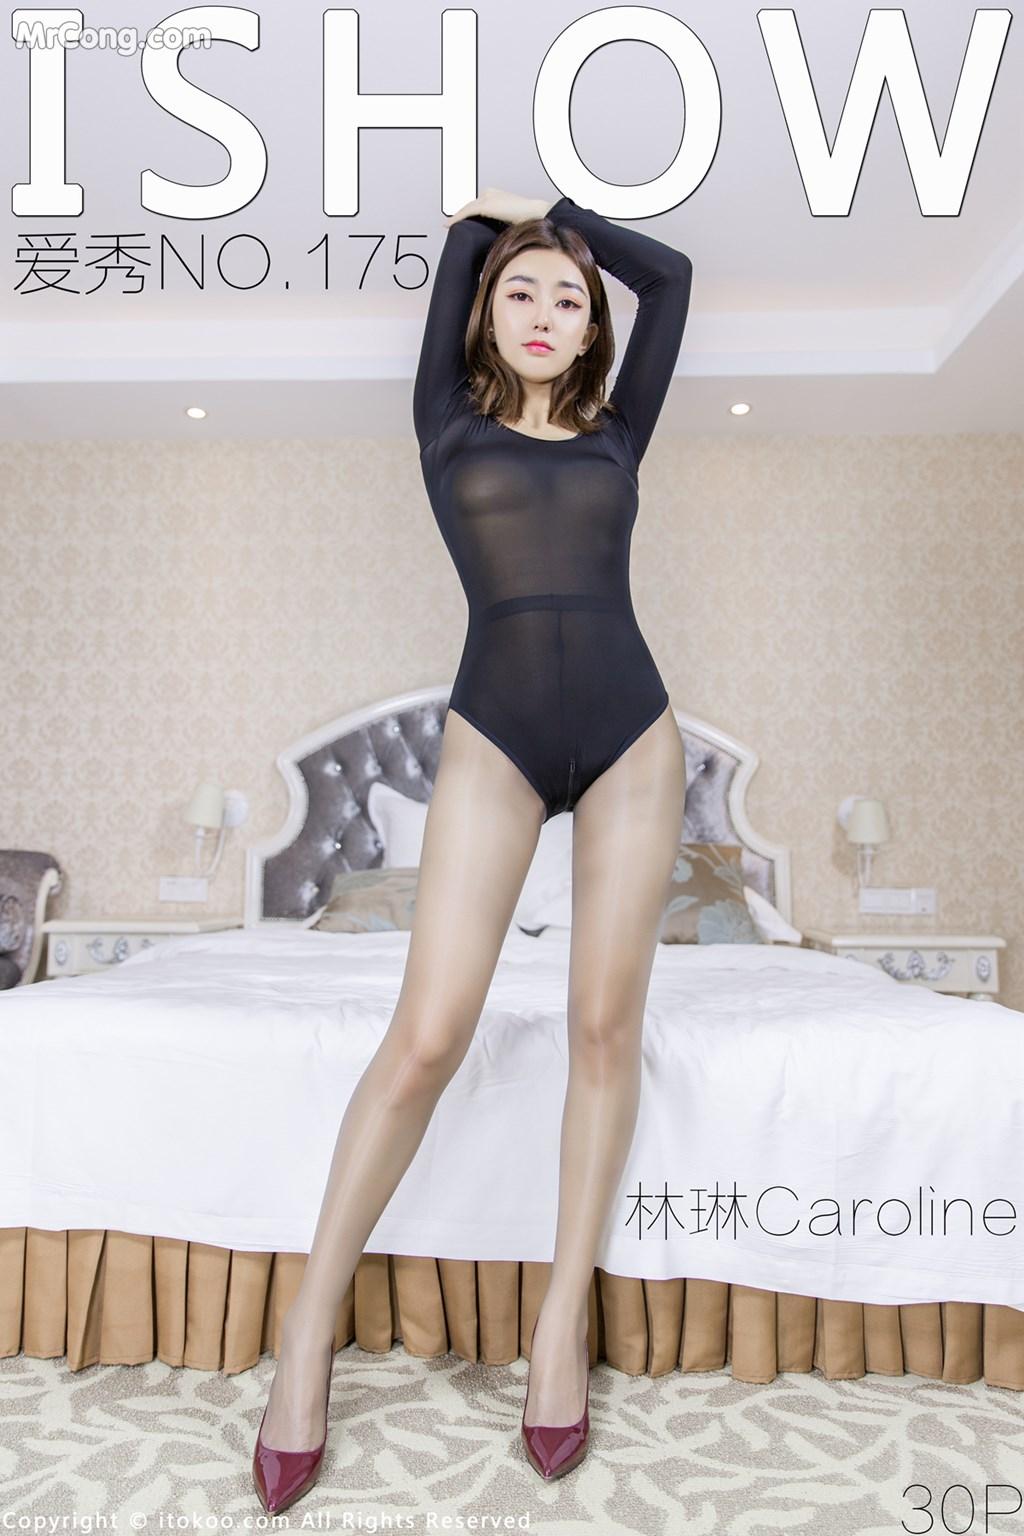 Image ISHOW-No.175-Caroline-MrCong.com-031 in post ISHOW No.175: Người mẫu 林琳Caroline (31 ảnh)